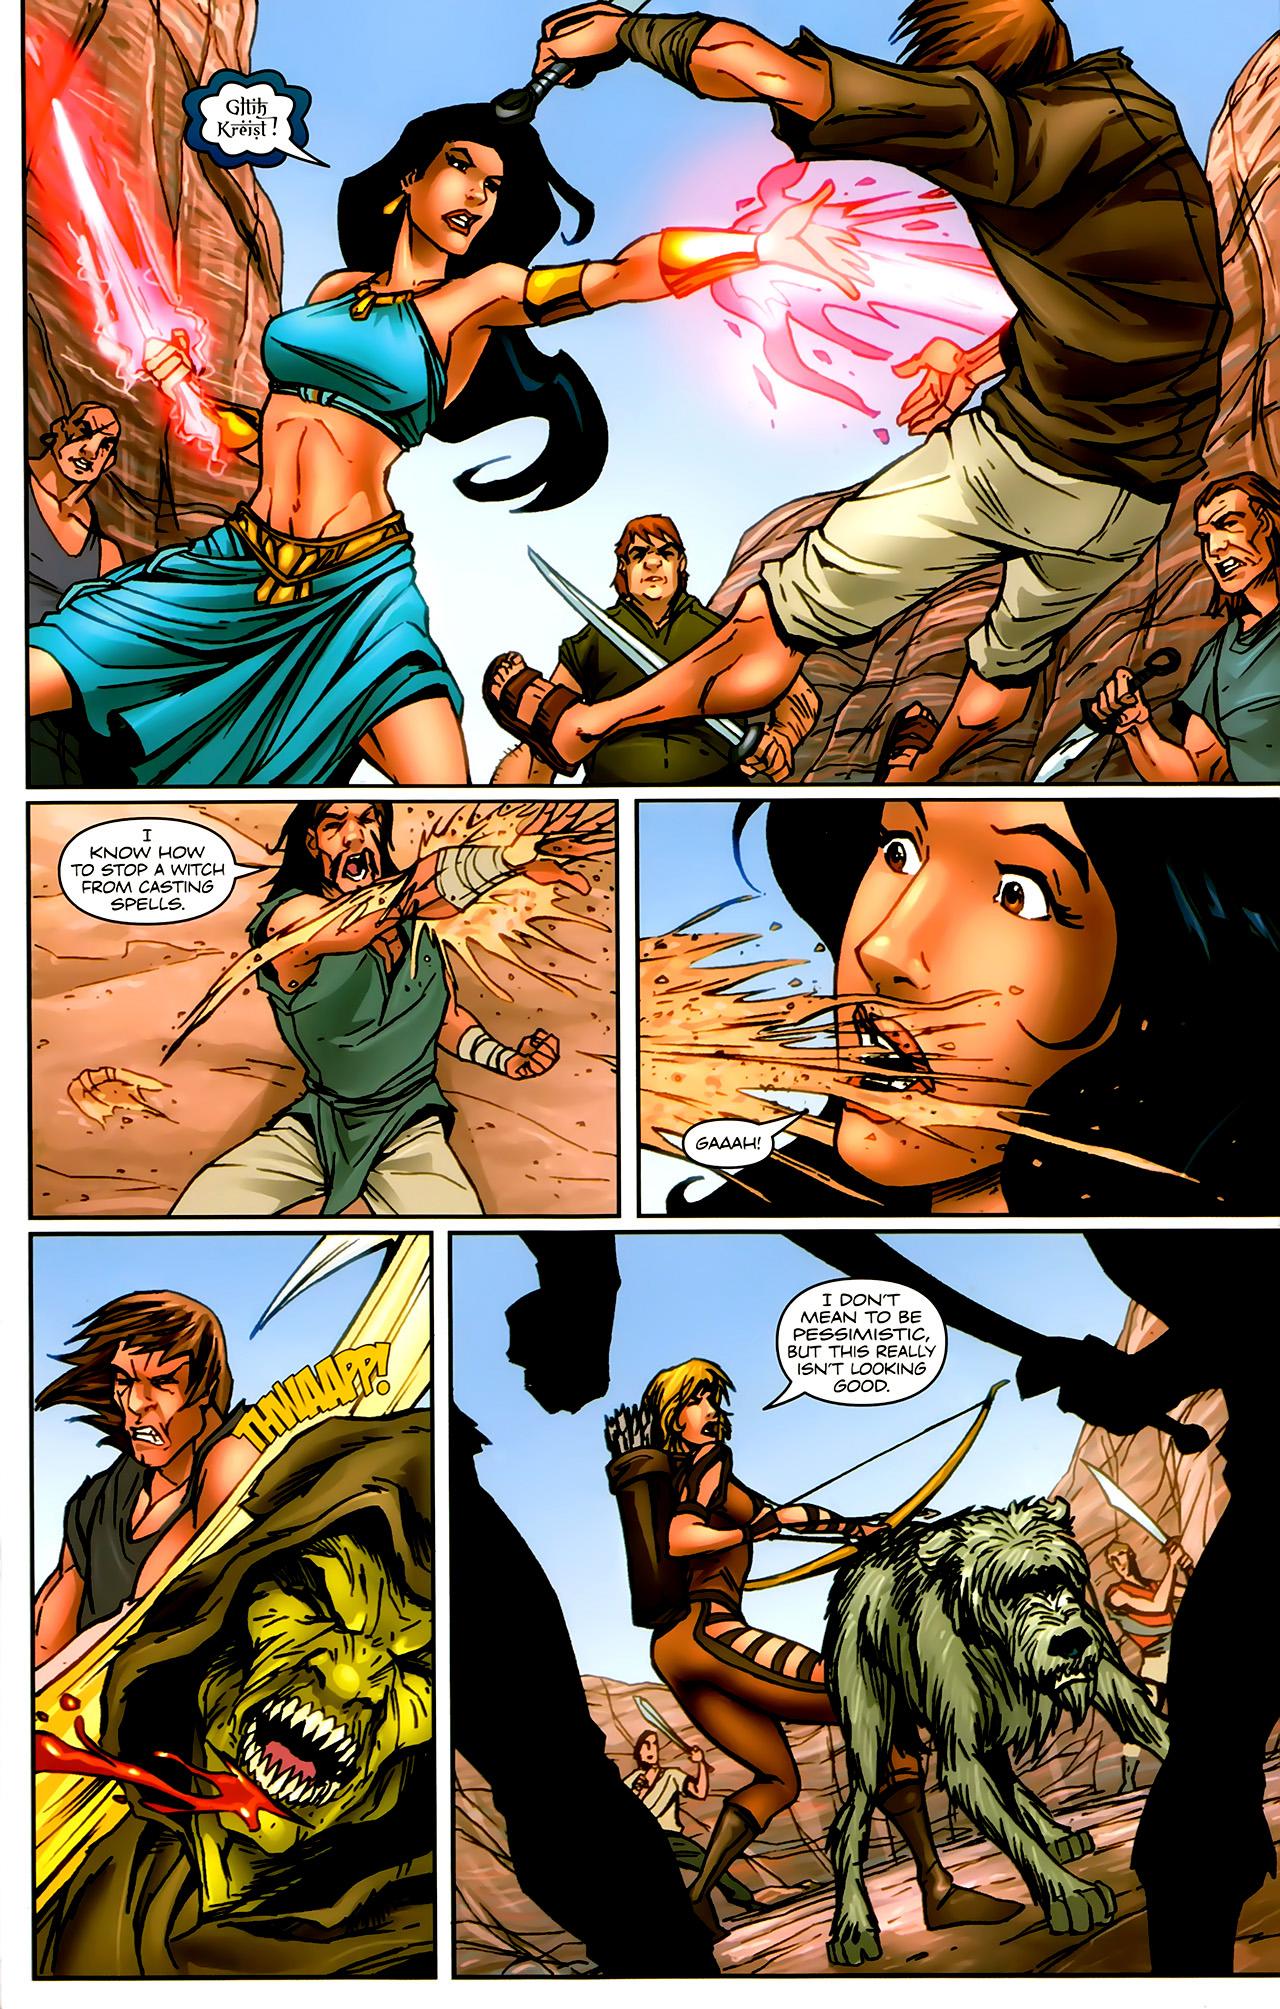 Read online 1001 Arabian Nights: The Adventures of Sinbad comic -  Issue #9 - 17